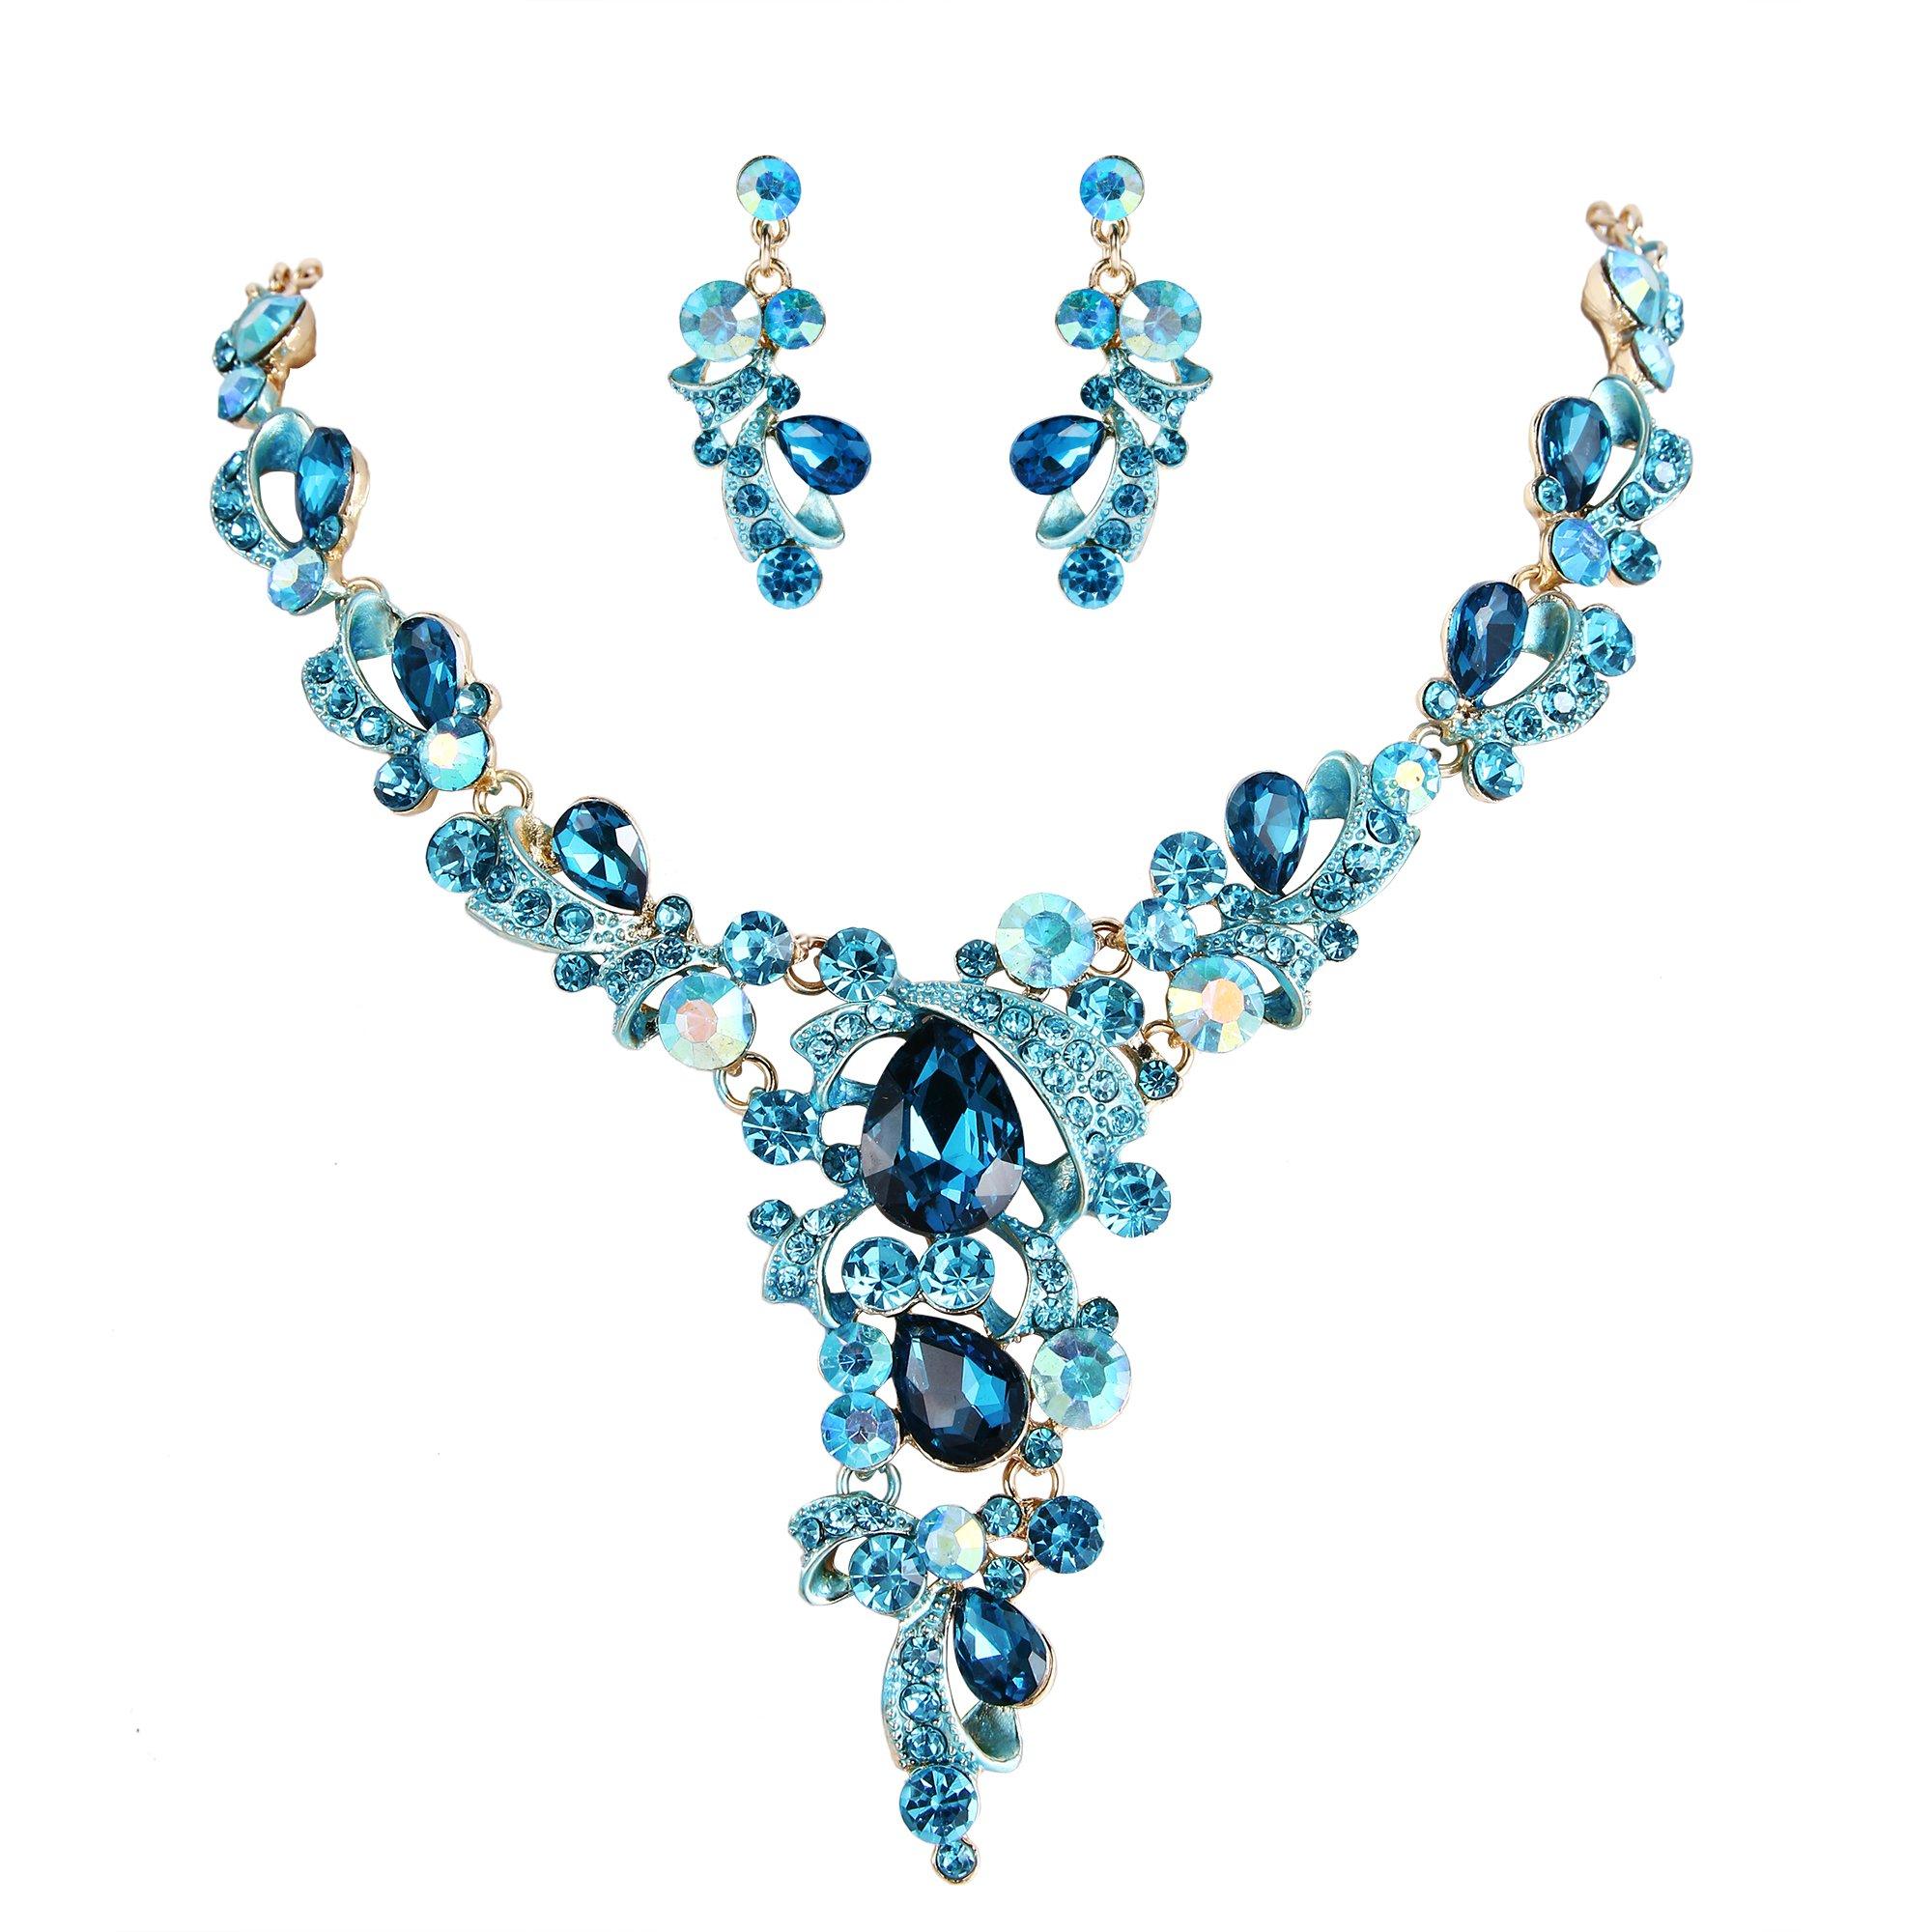 BriLove Women's Wedding Bridal Statement Necklace Dangle Earrings Jewelry Set with Crystal Leaf Vine Teardrop Hollow Design Blue Topaz Color Gold-Tone